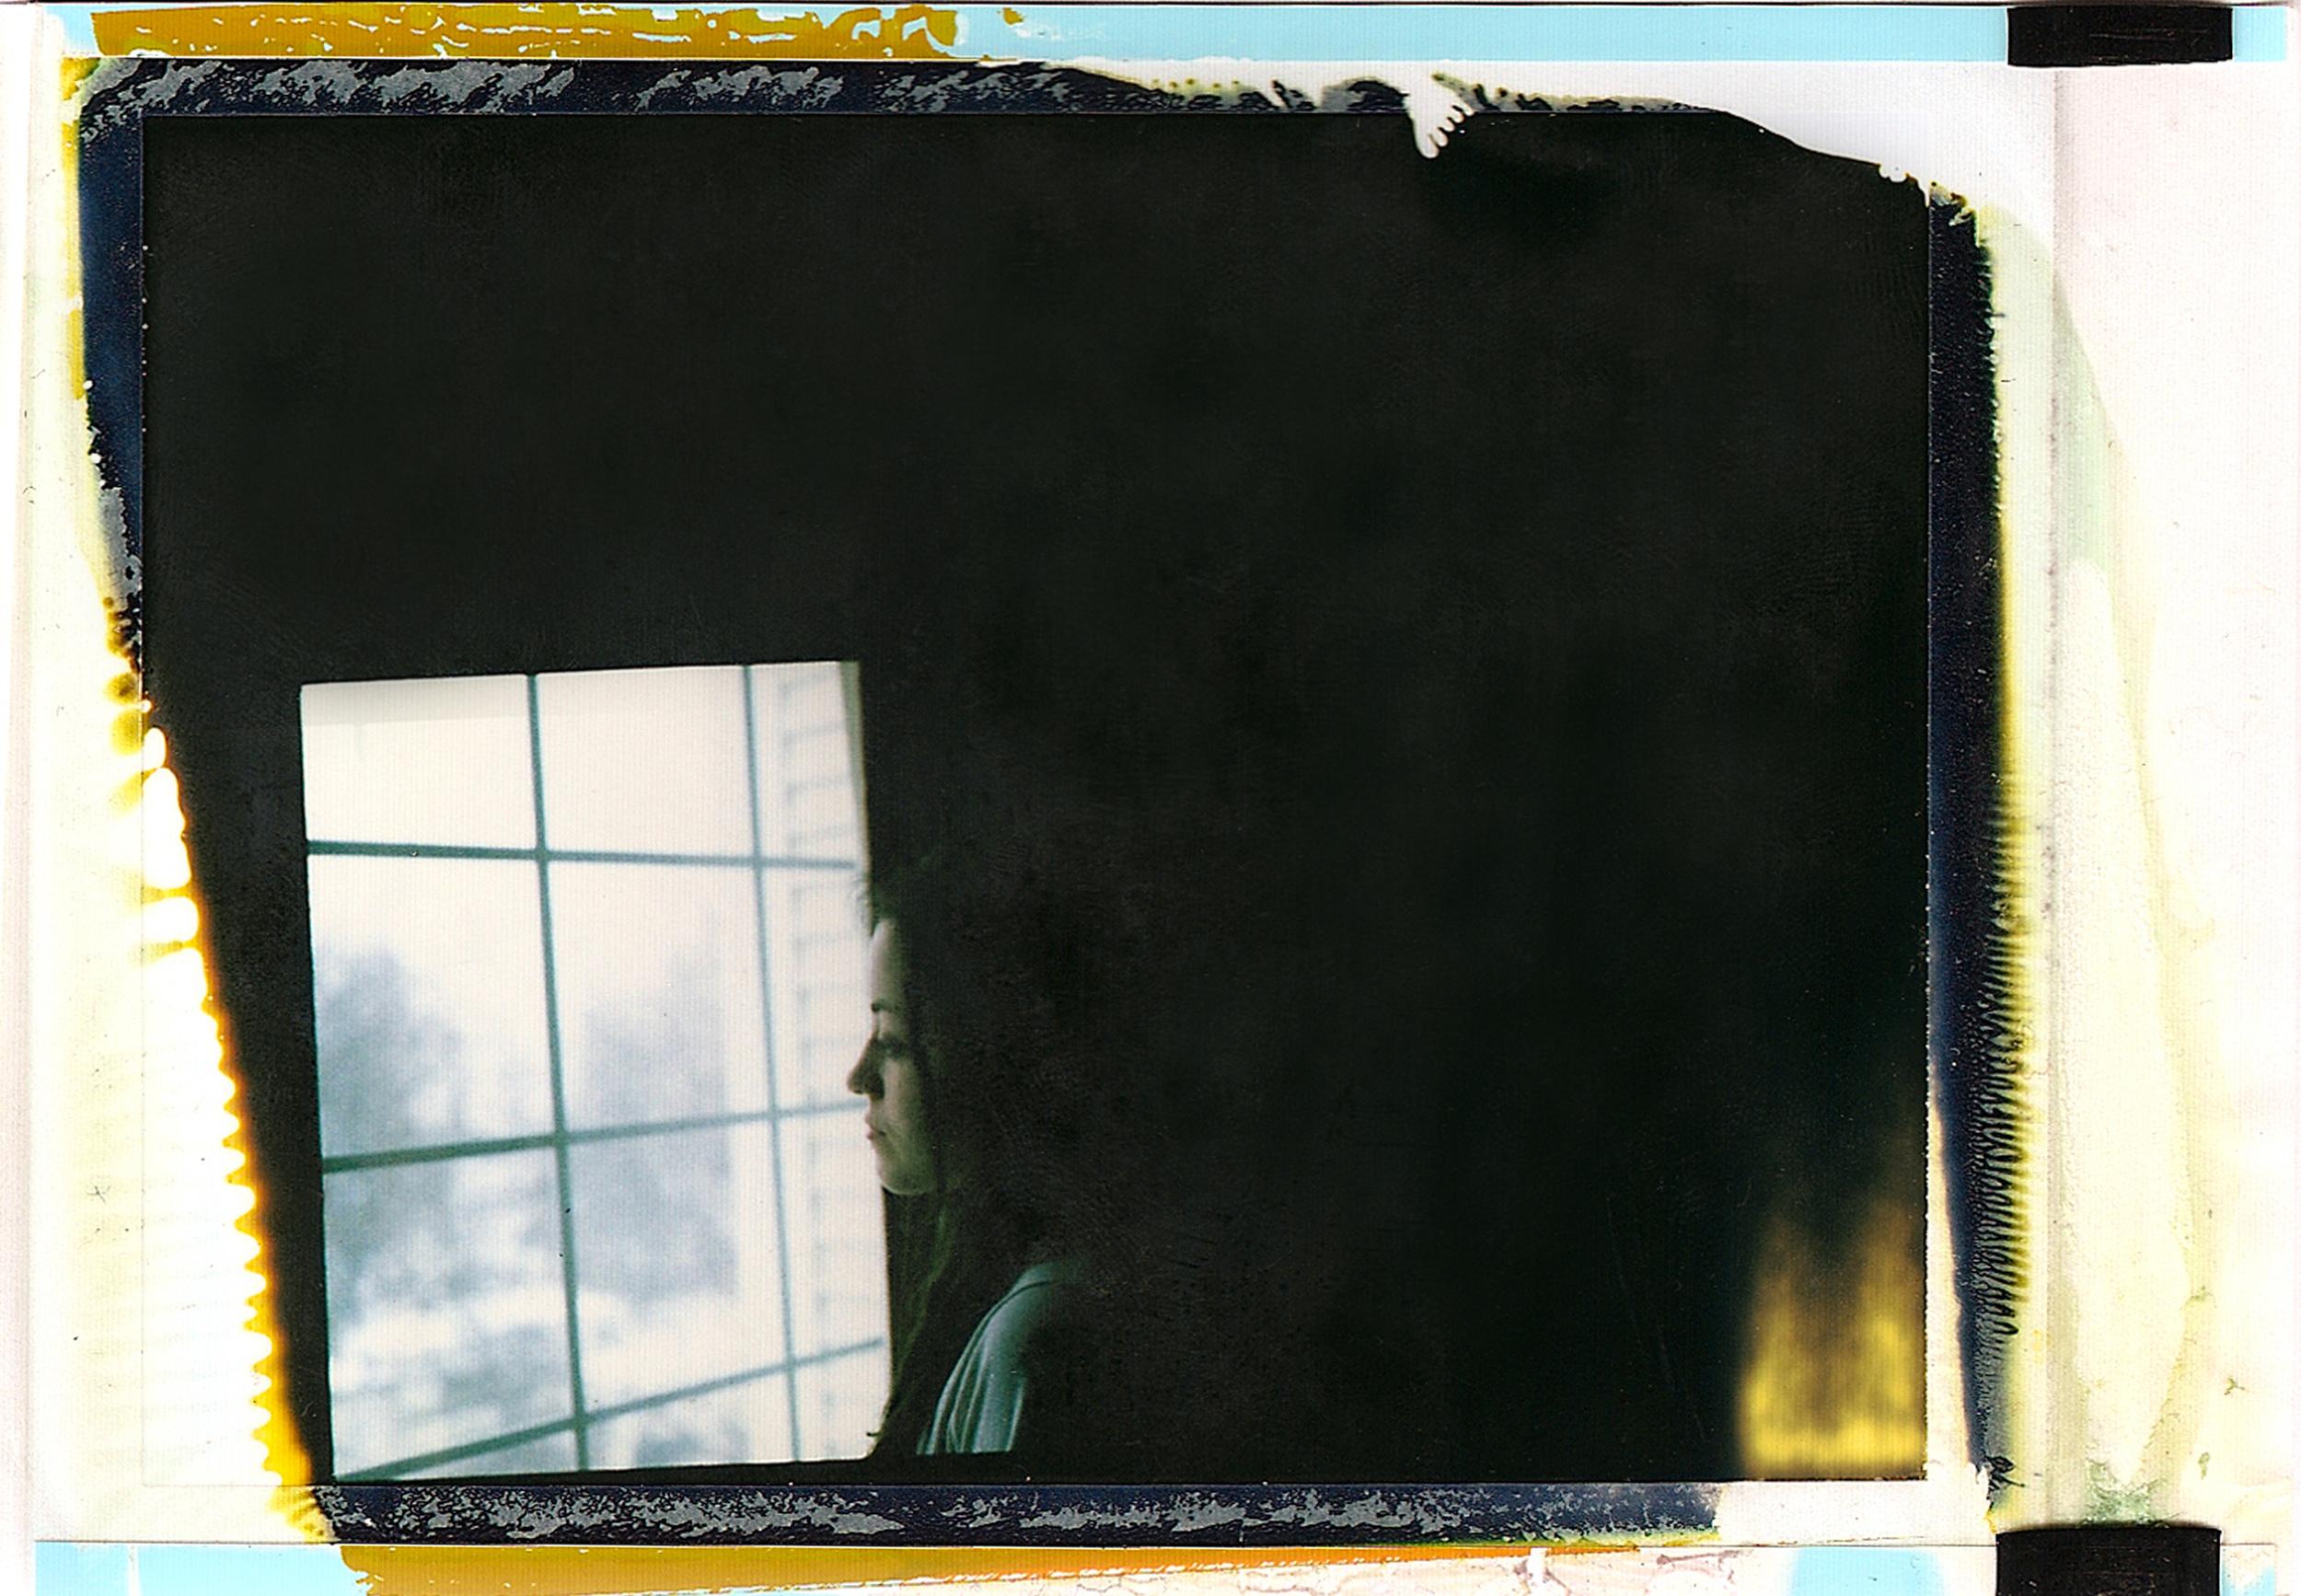 vero at window2.jpg